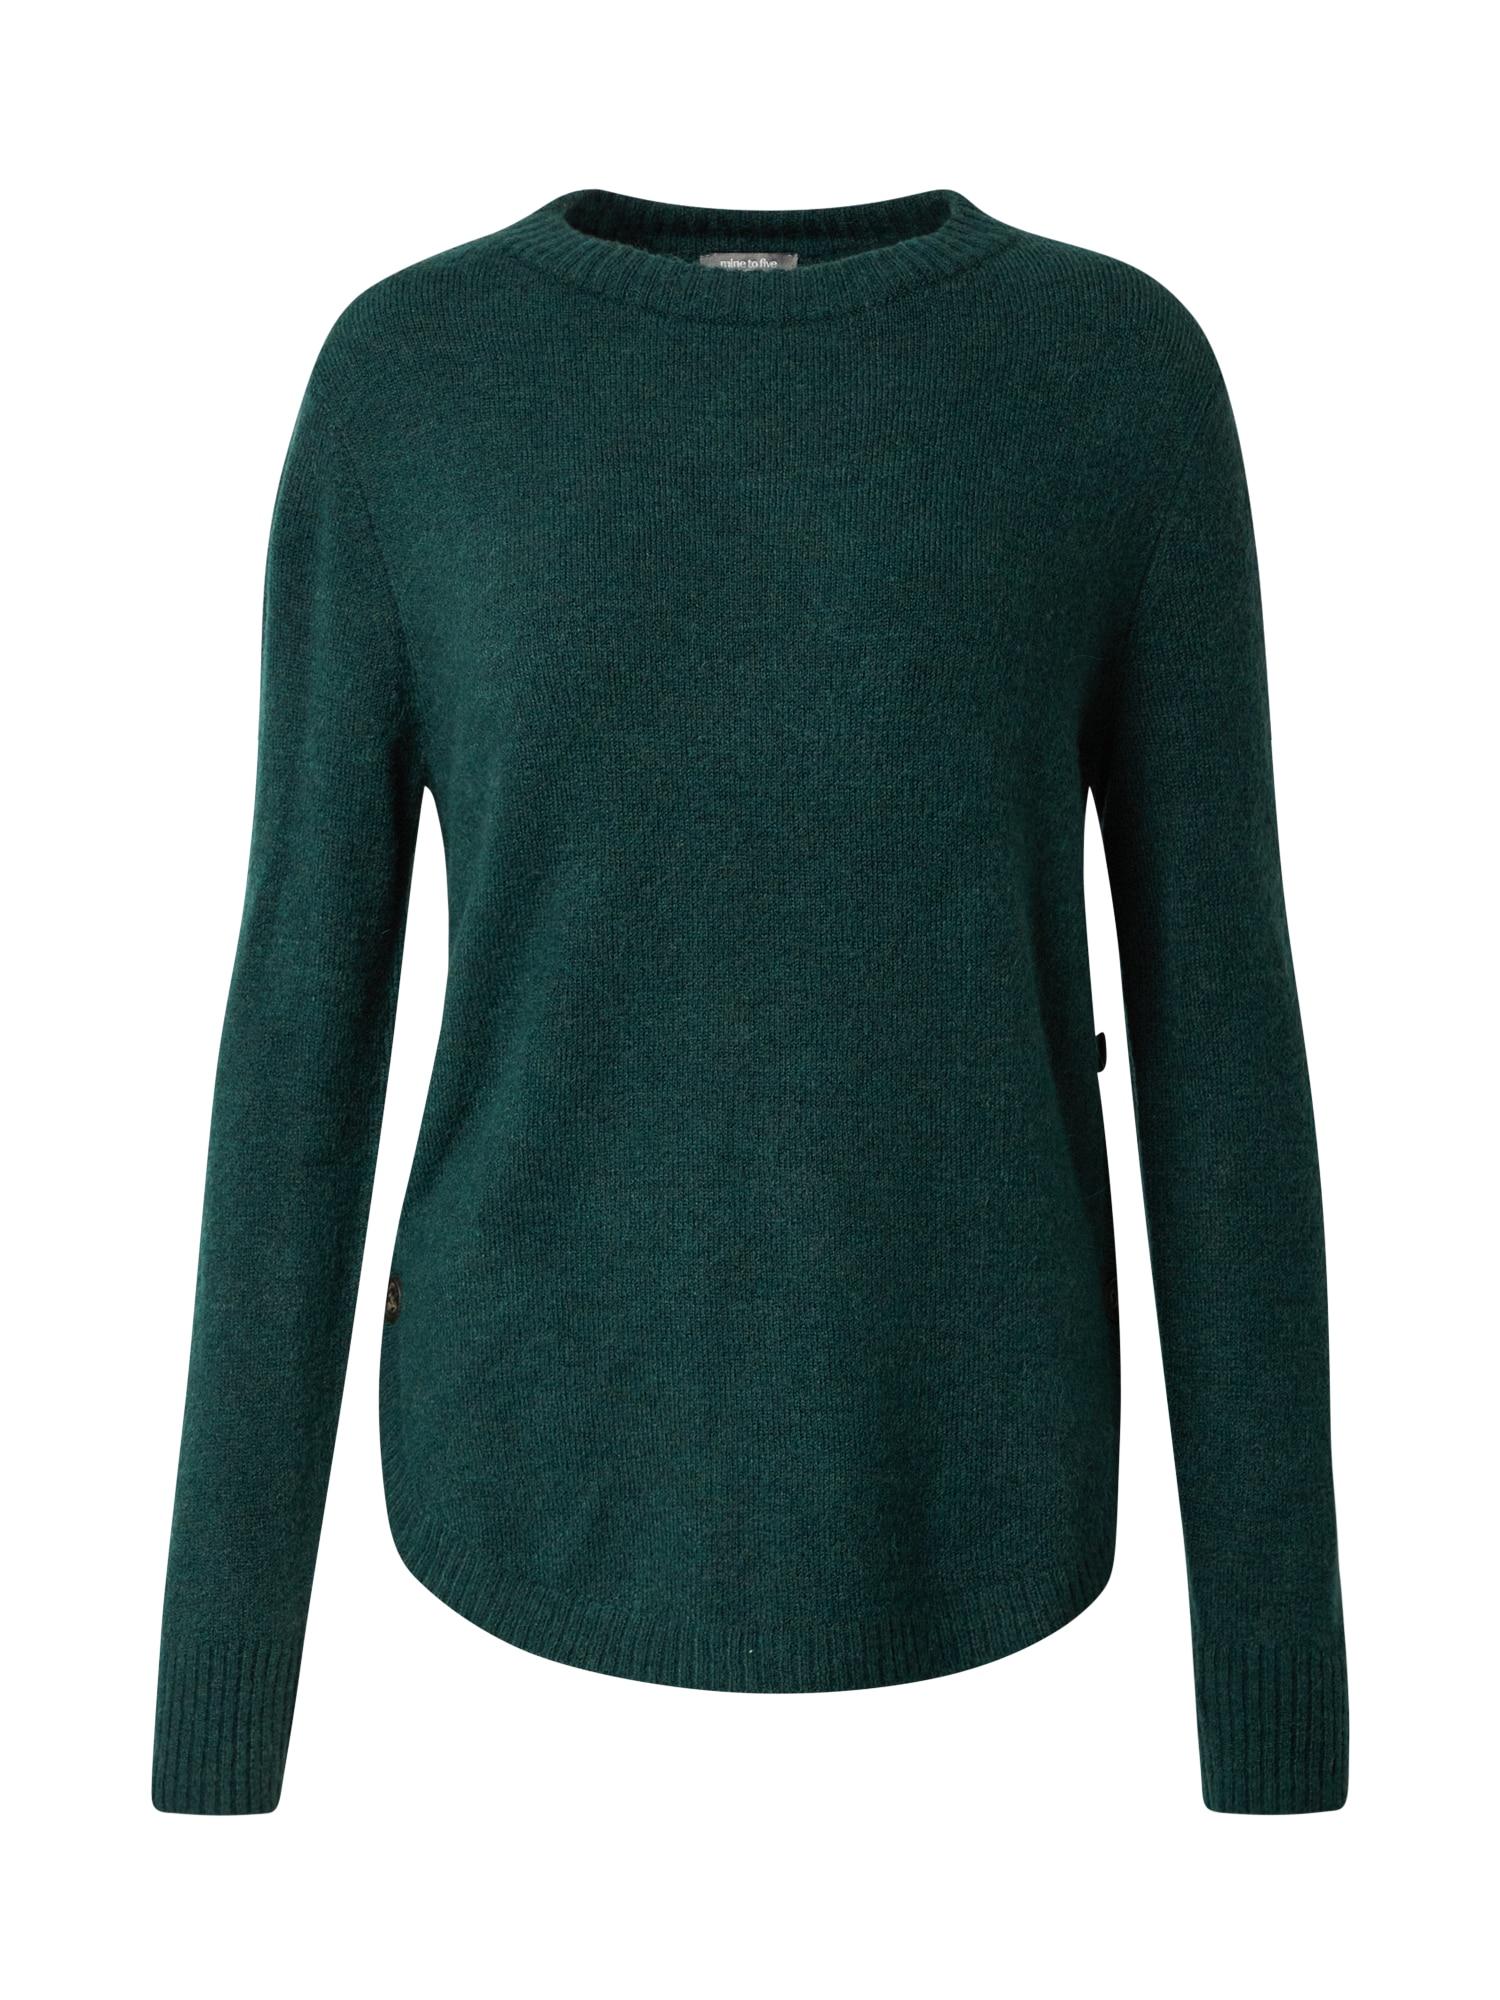 MINE TO FIVE Megztinis tamsiai žalia